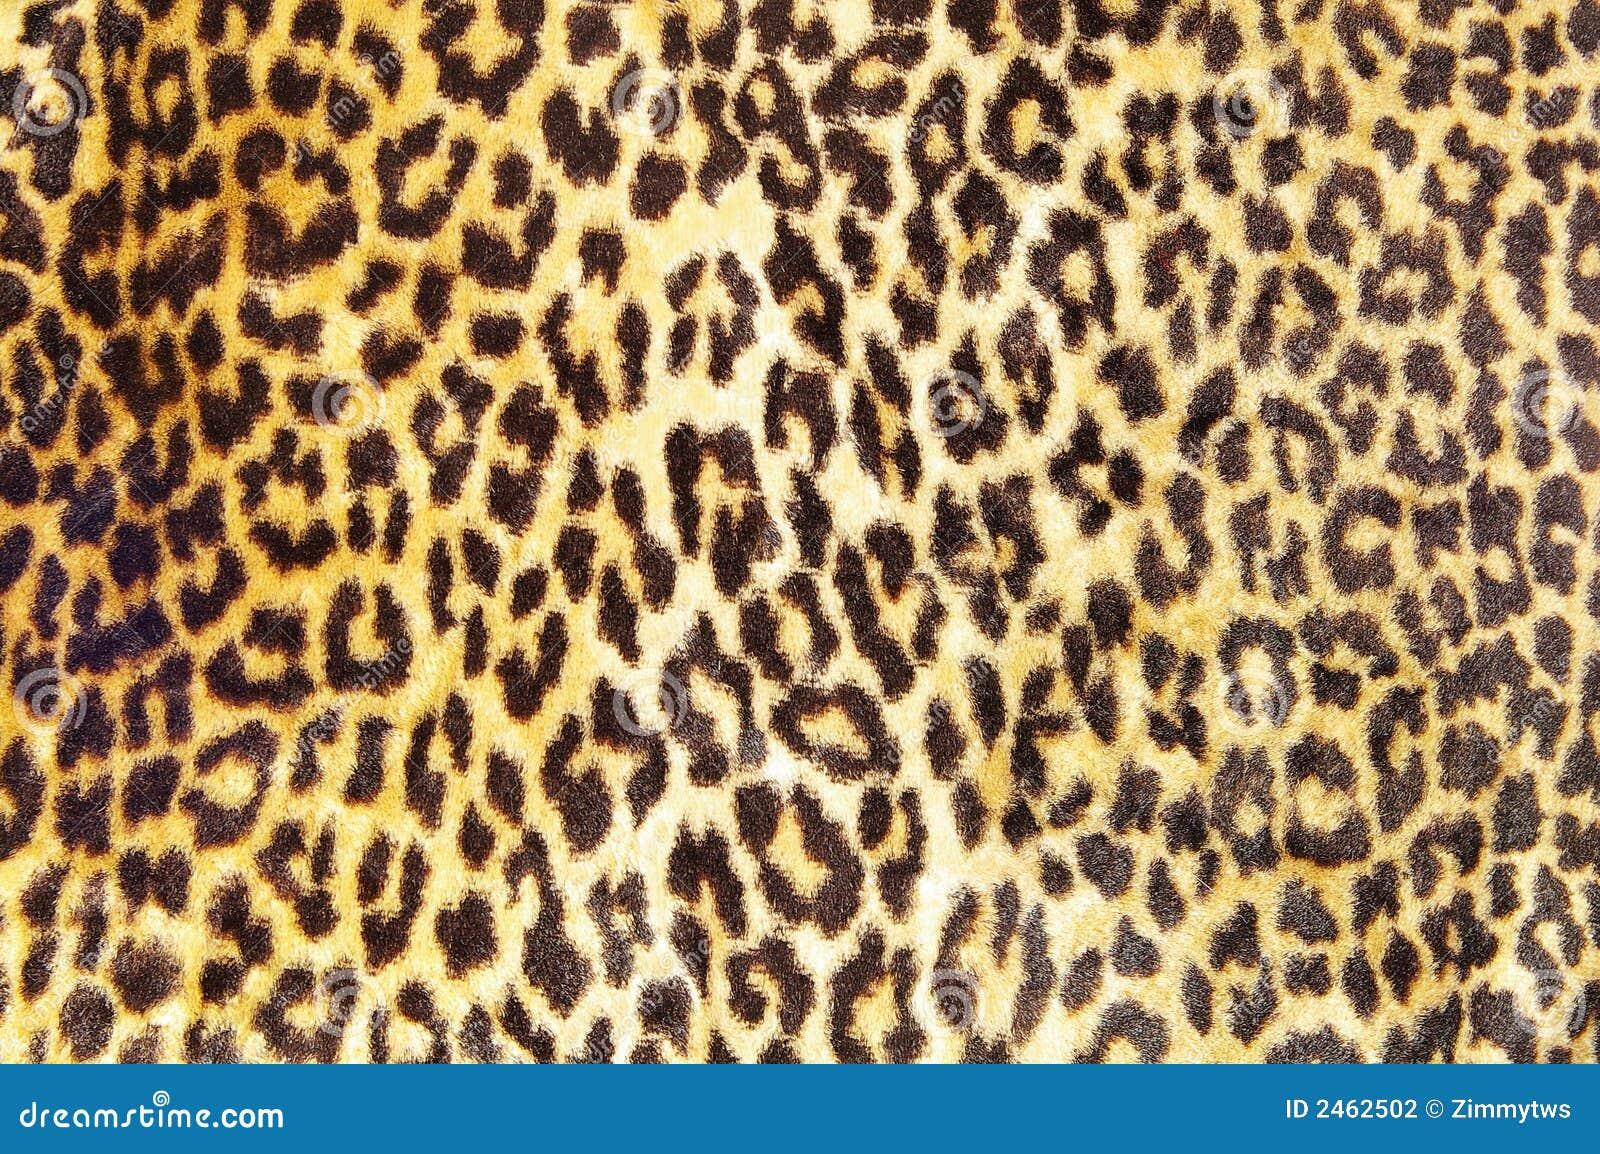 animal print seamless pattern - photo #34